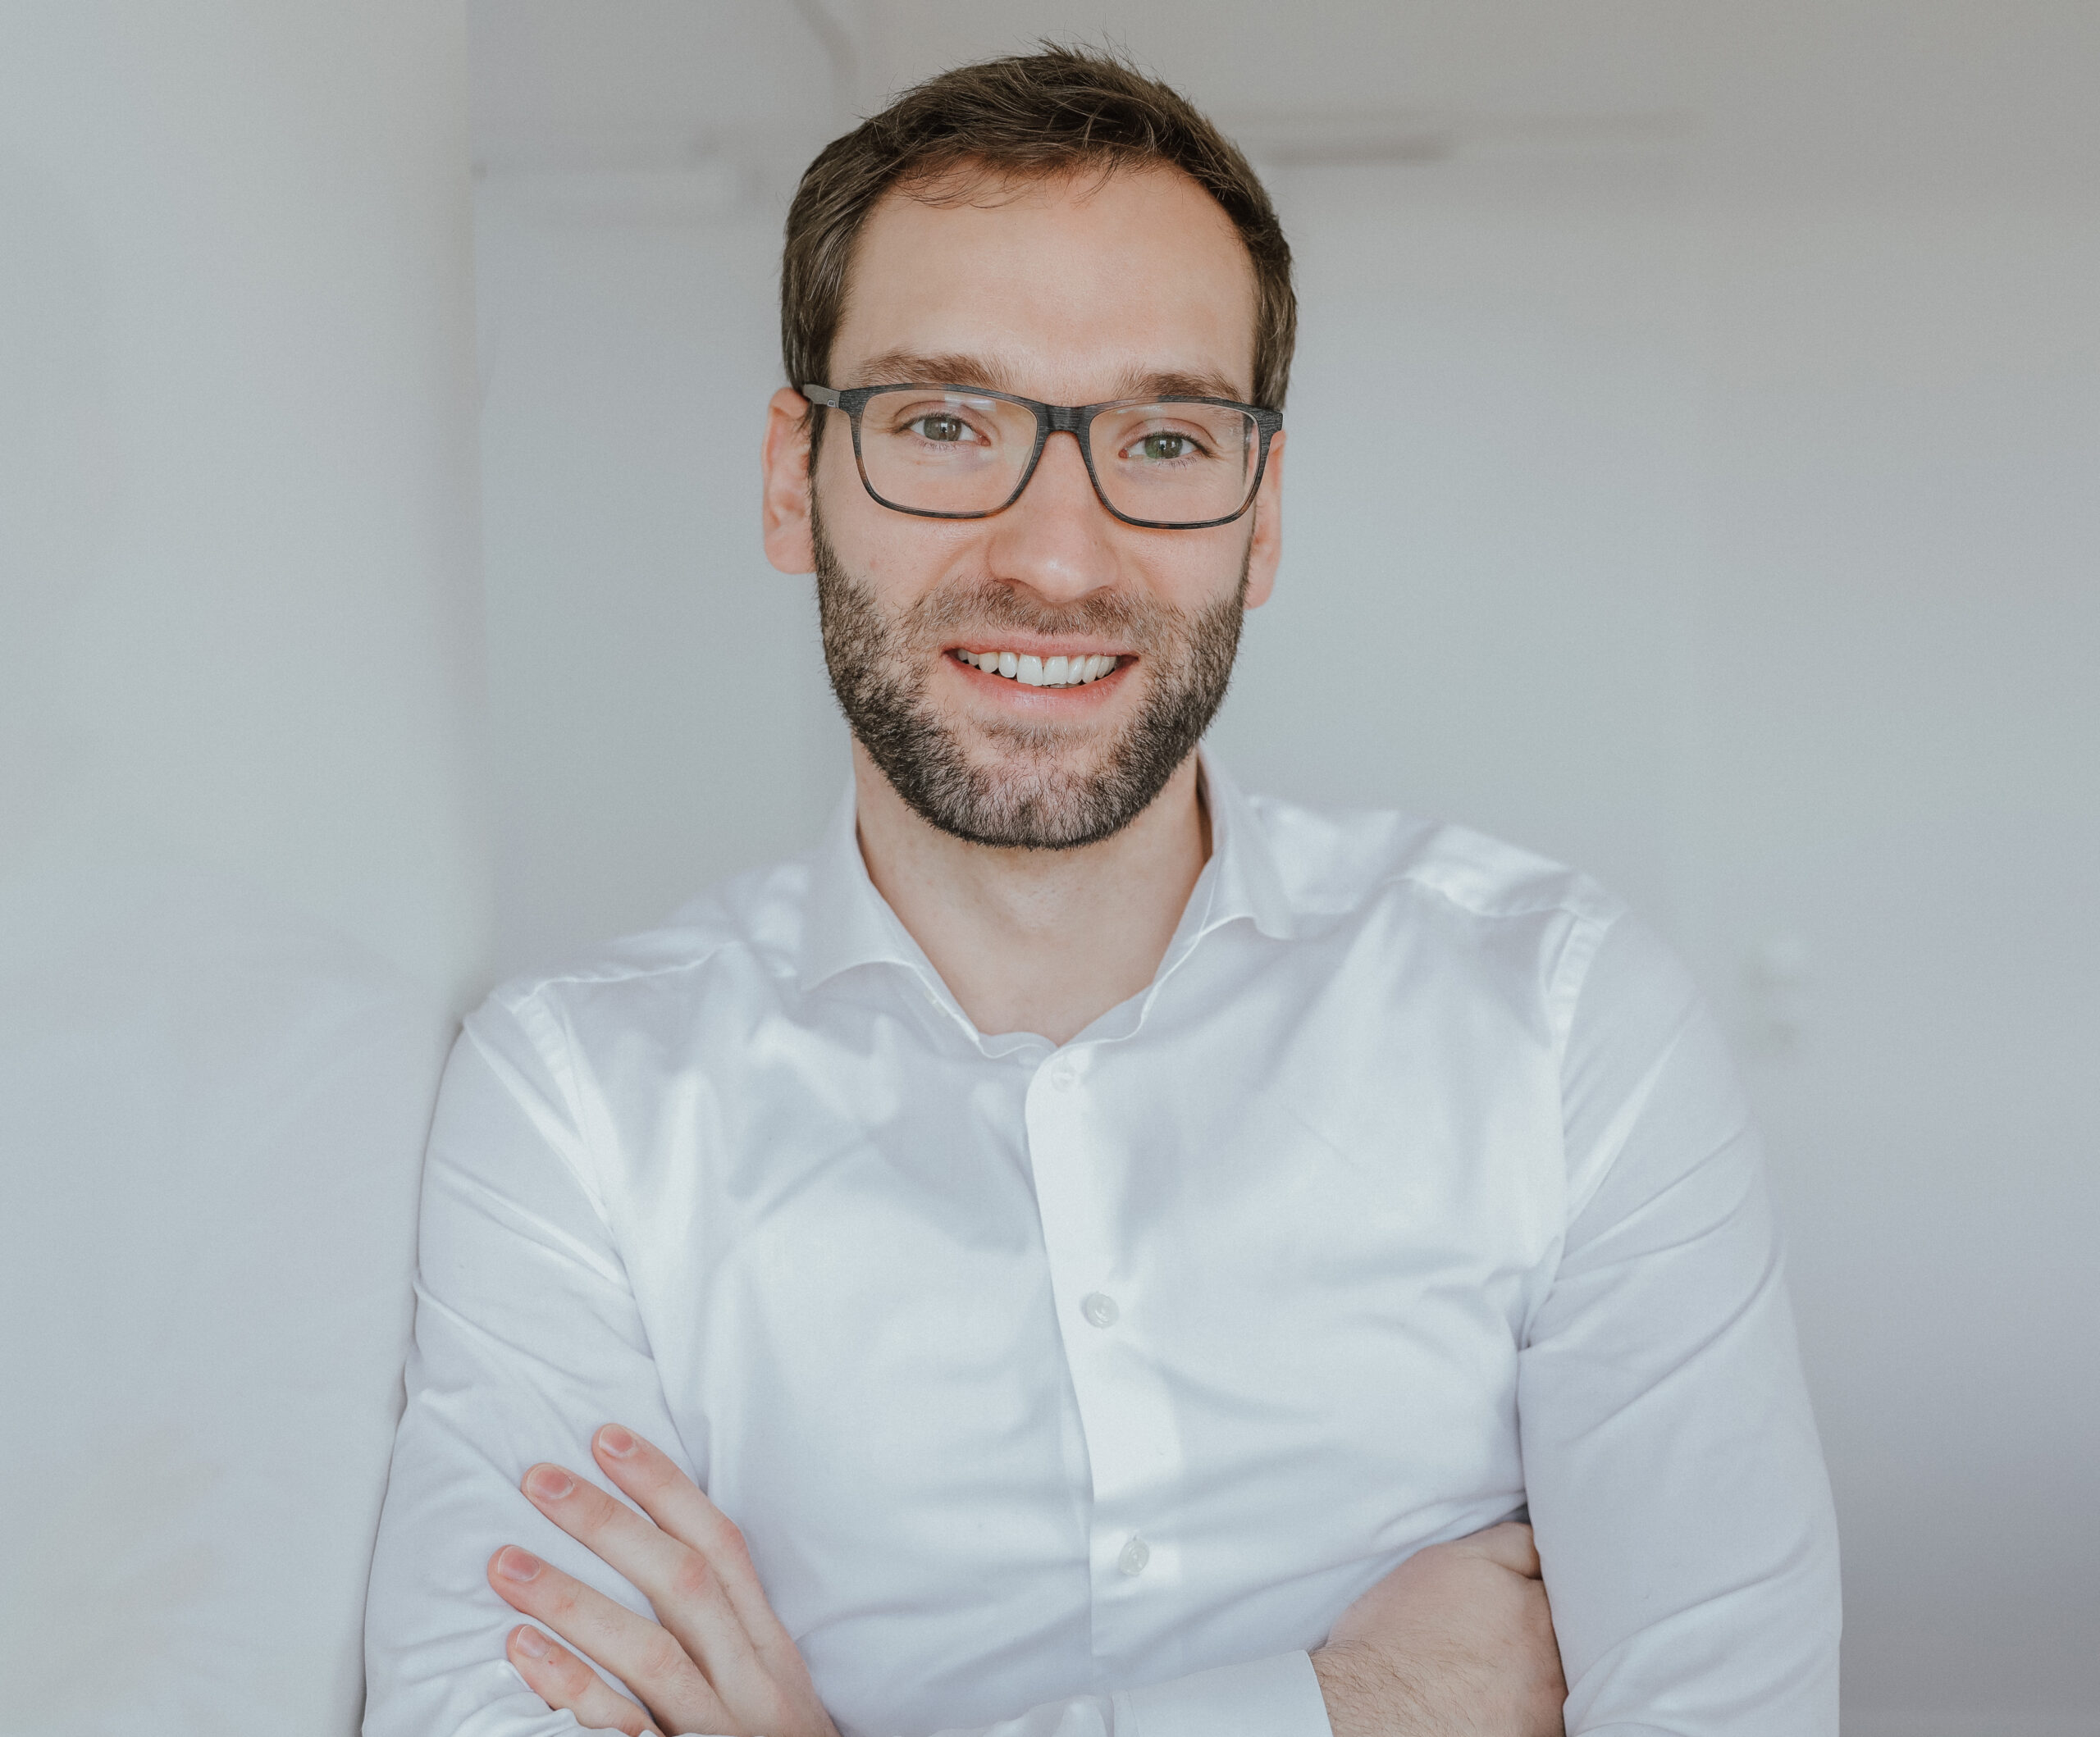 Patrick Köhnke